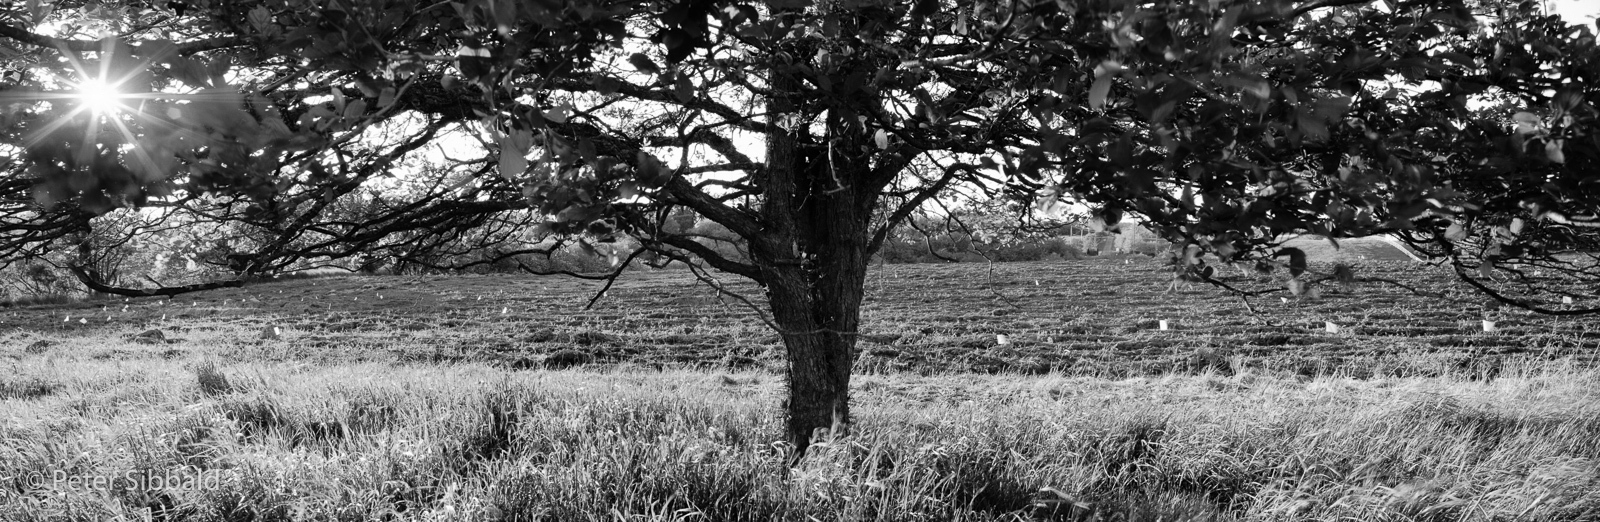 Art and Documentary Photography - Loading 033-2006_spr_054_2.jpg